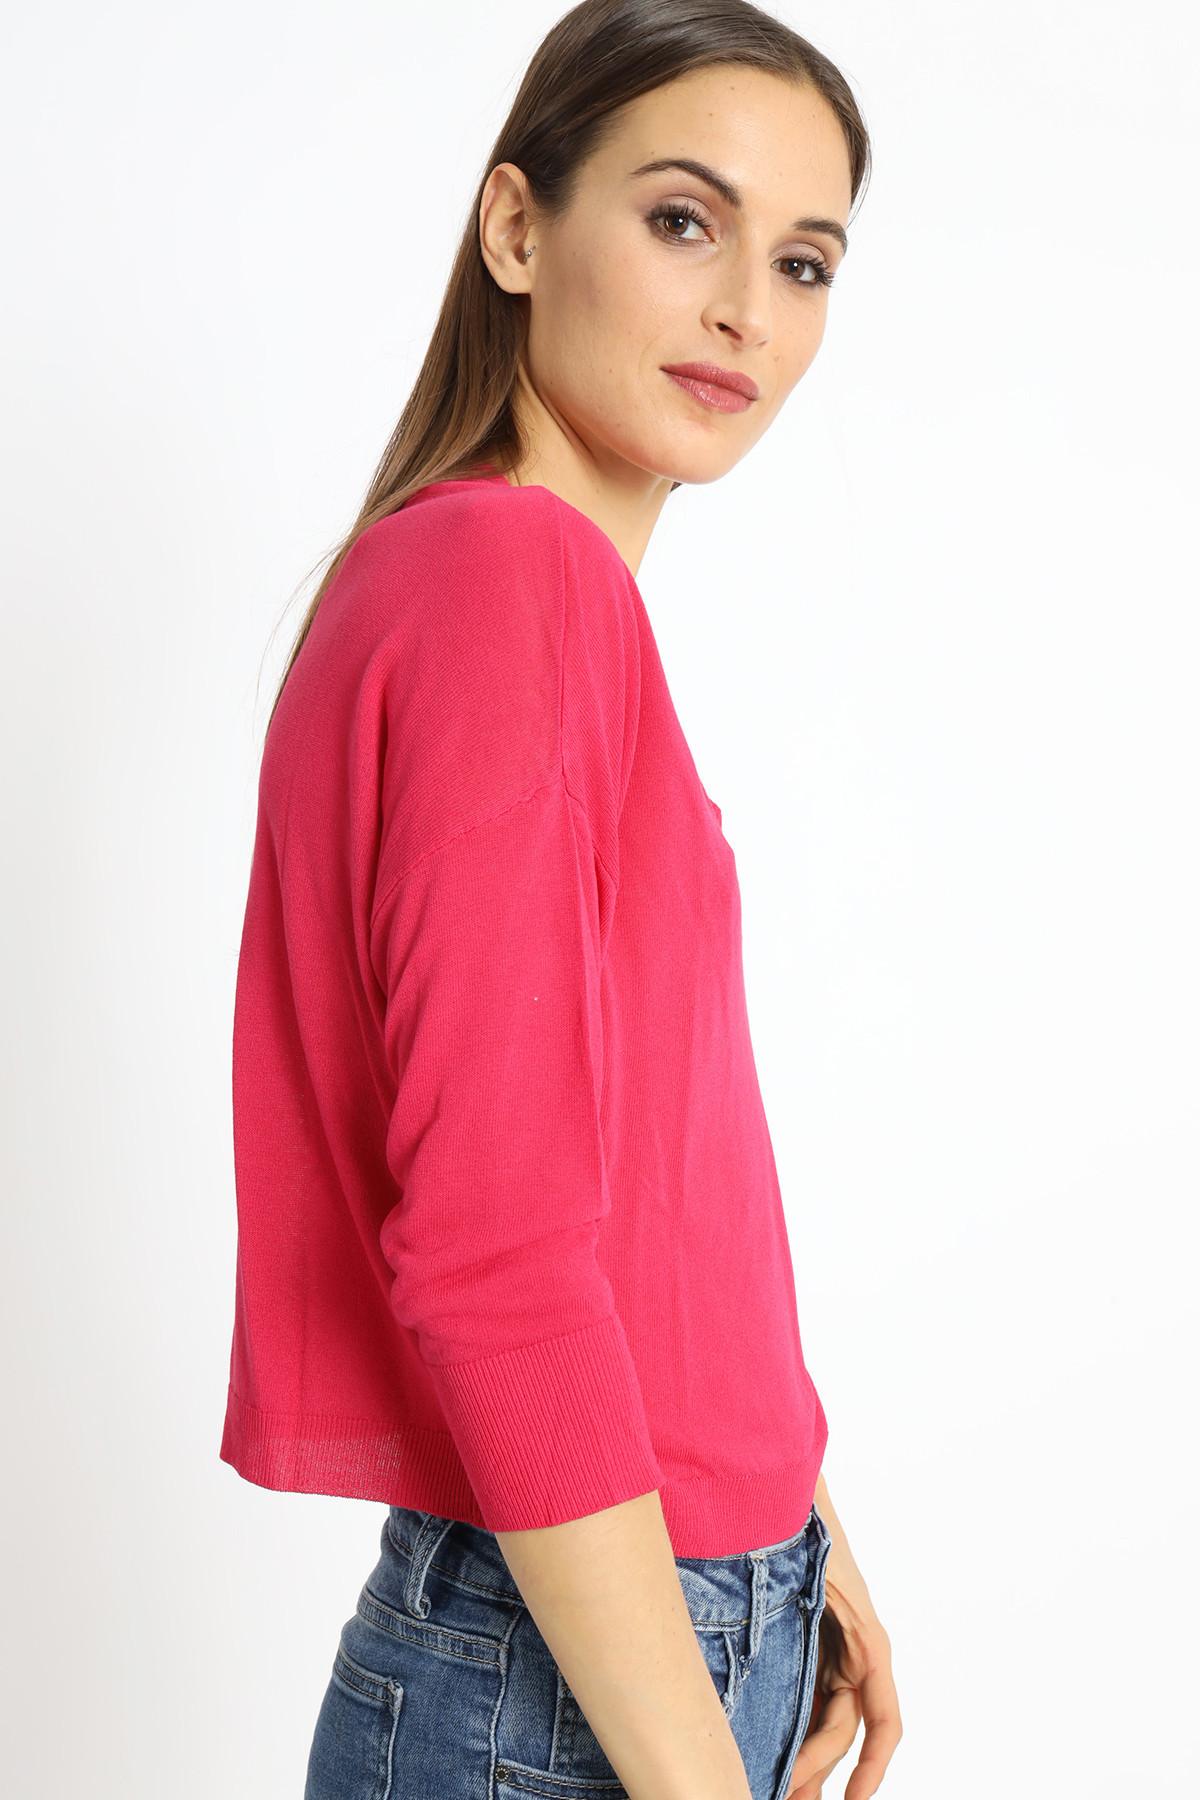 V-neck sweater in viscose